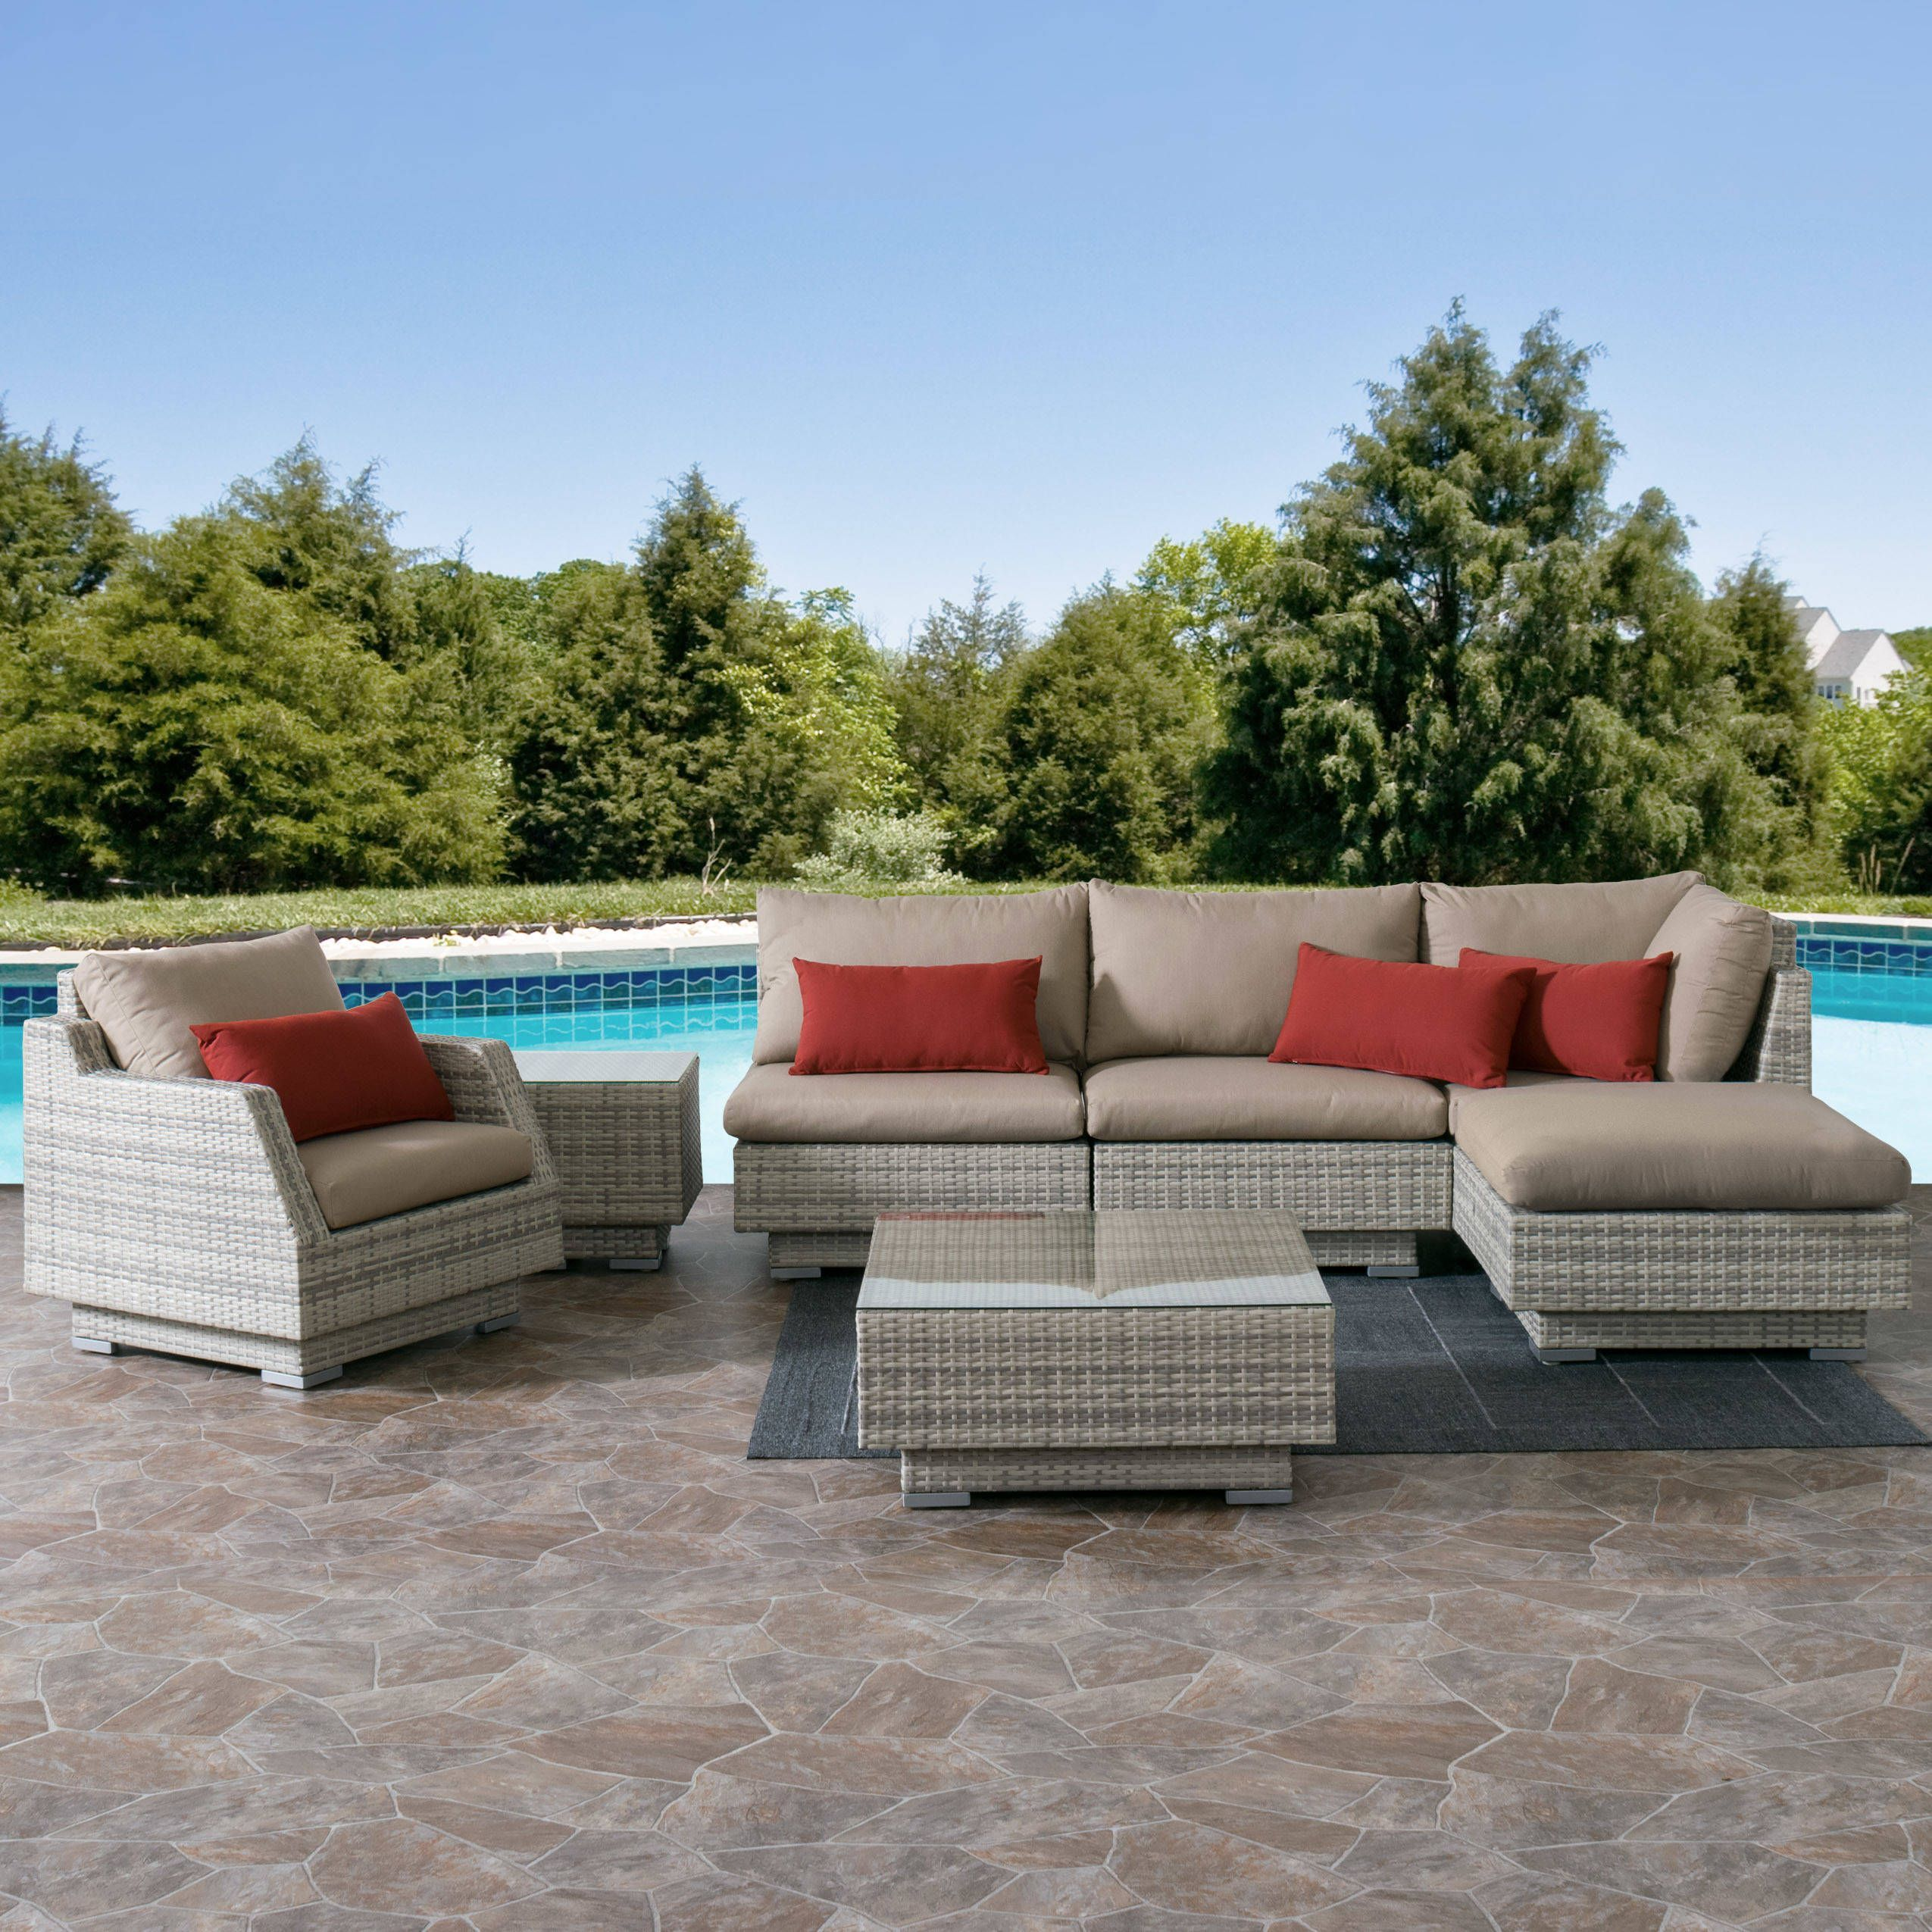 CorLiving Azure Sunbrella UV And Weather Resistant 7 Piece Wicker Patio  Sectional Set (Beige), Size 7 Piece Sets, Patio Furniture (Aluminum)